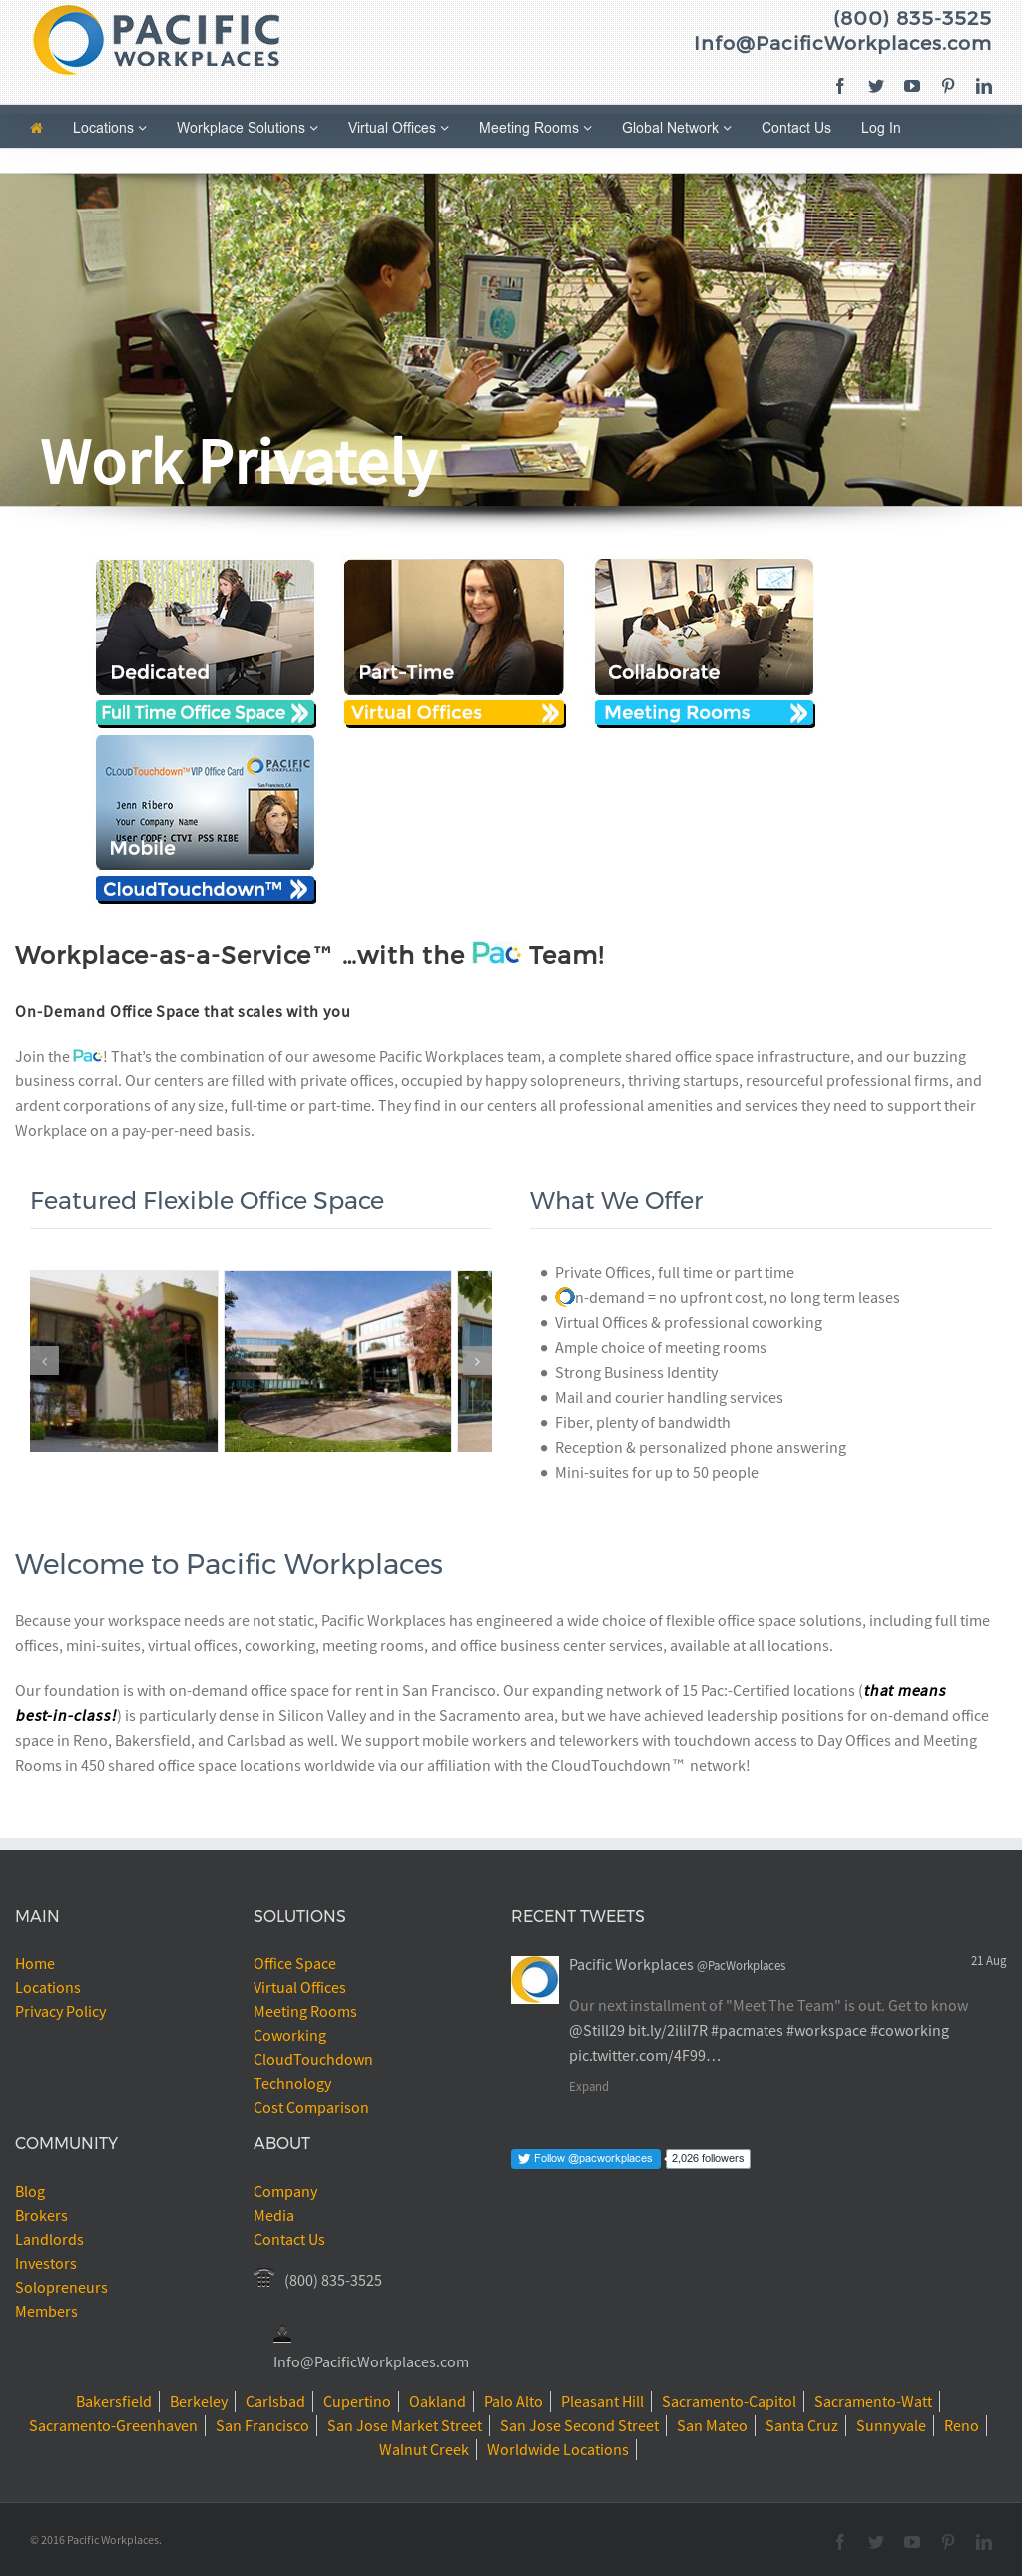 virtual office reno. Pacific Workplaces Website History Virtual Office Reno